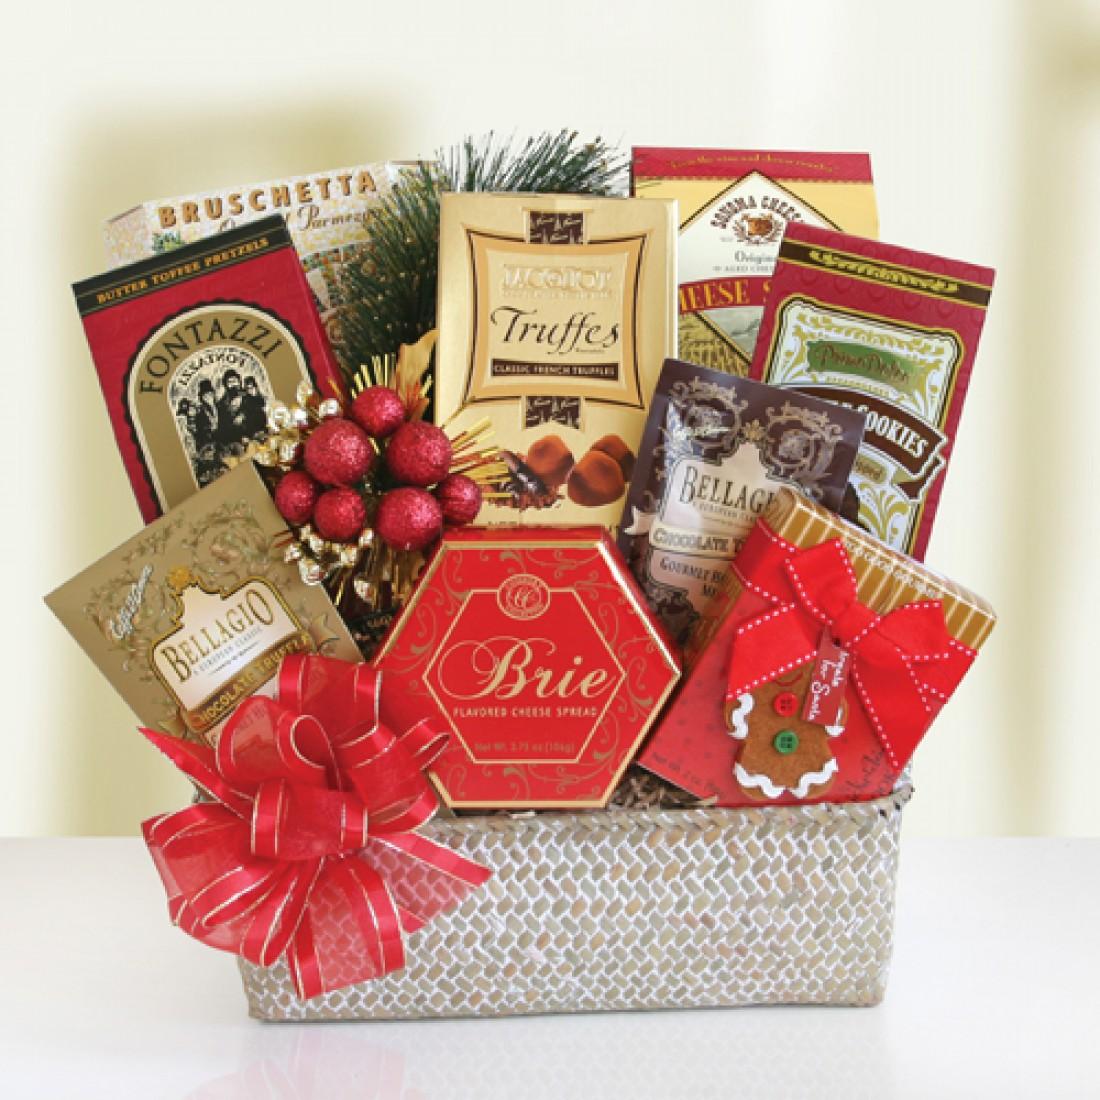 Festive Holiday Food Baskets 7919 At Print EZ.